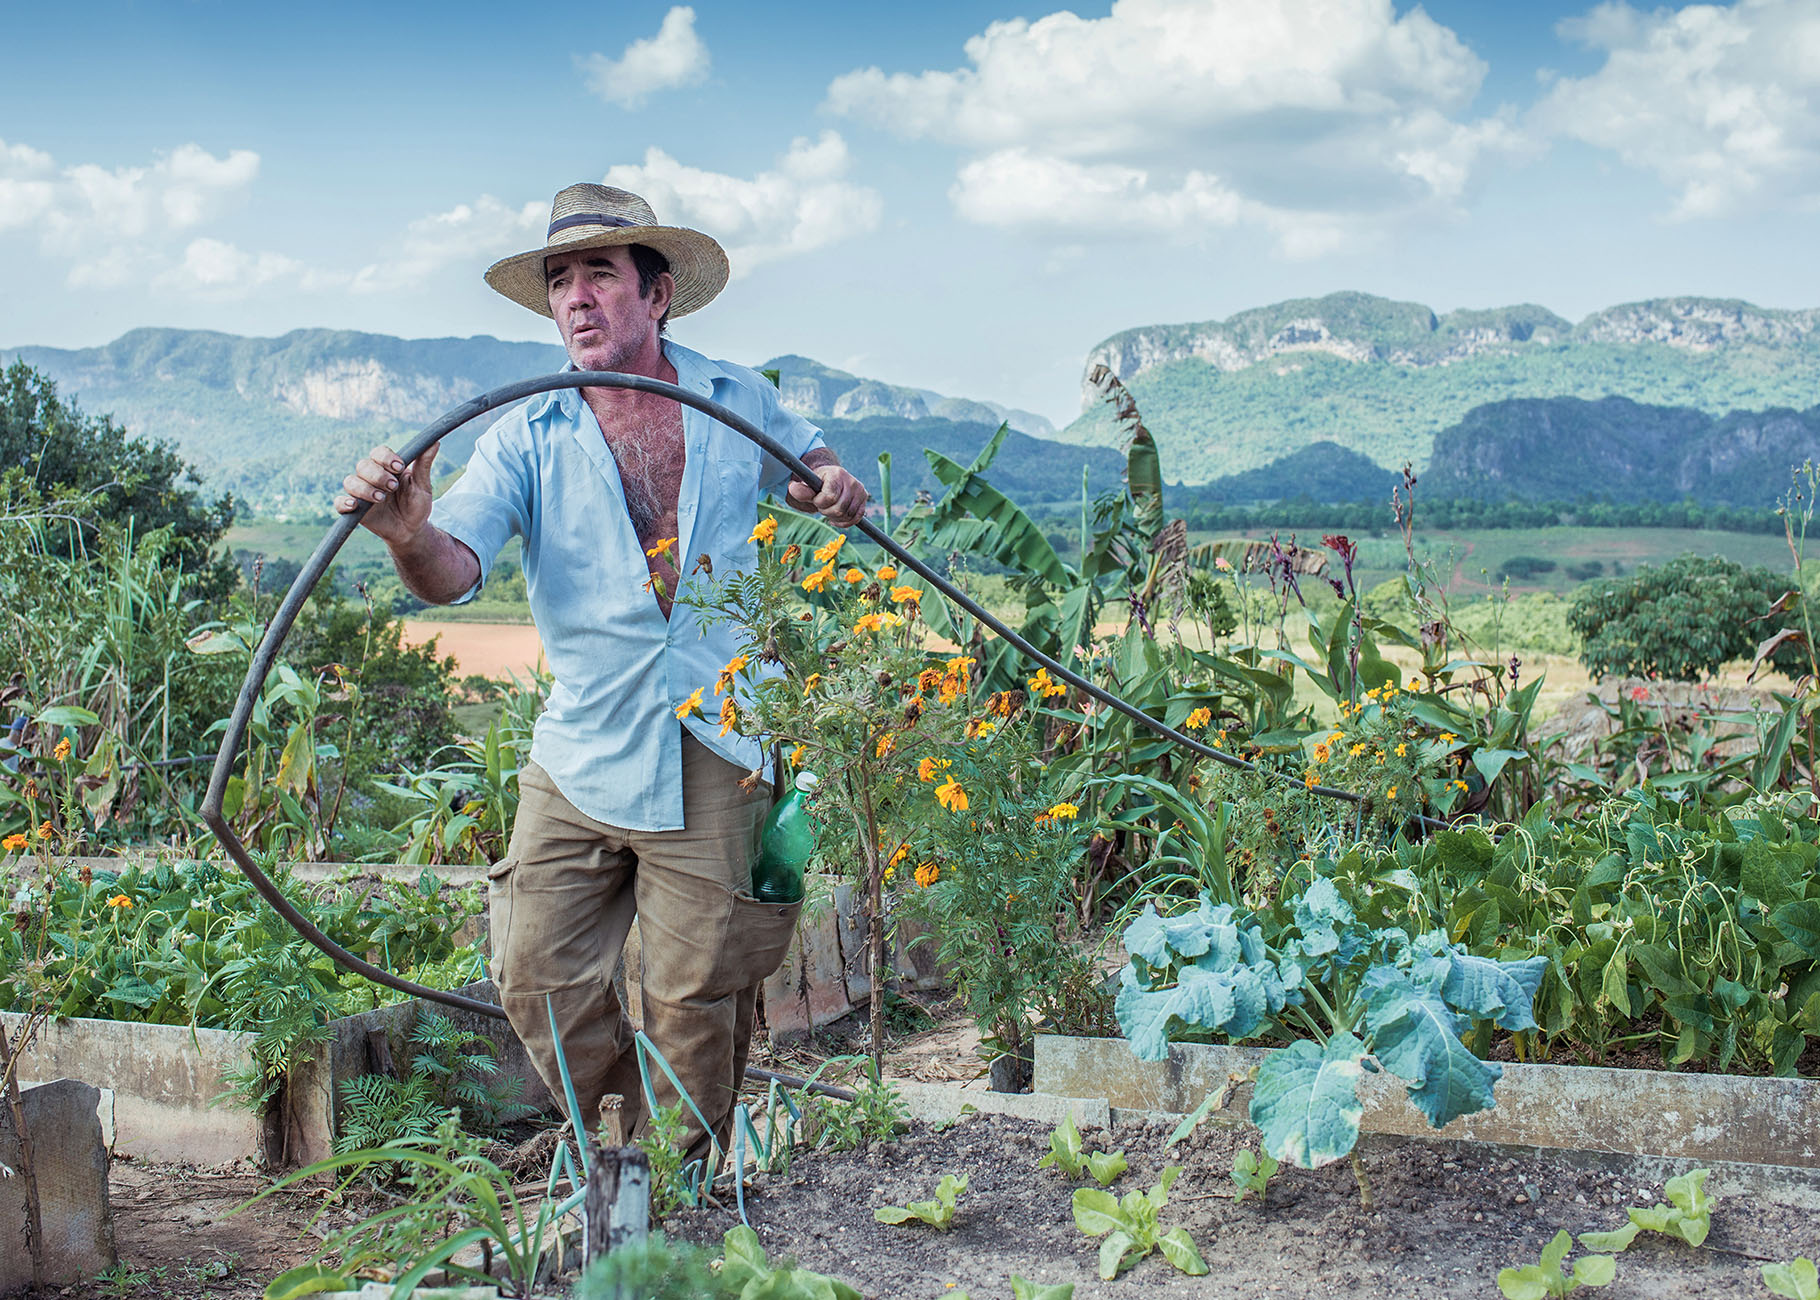 Alejandro_Perez_Cuba_West_Vinales_Farmer.jpg